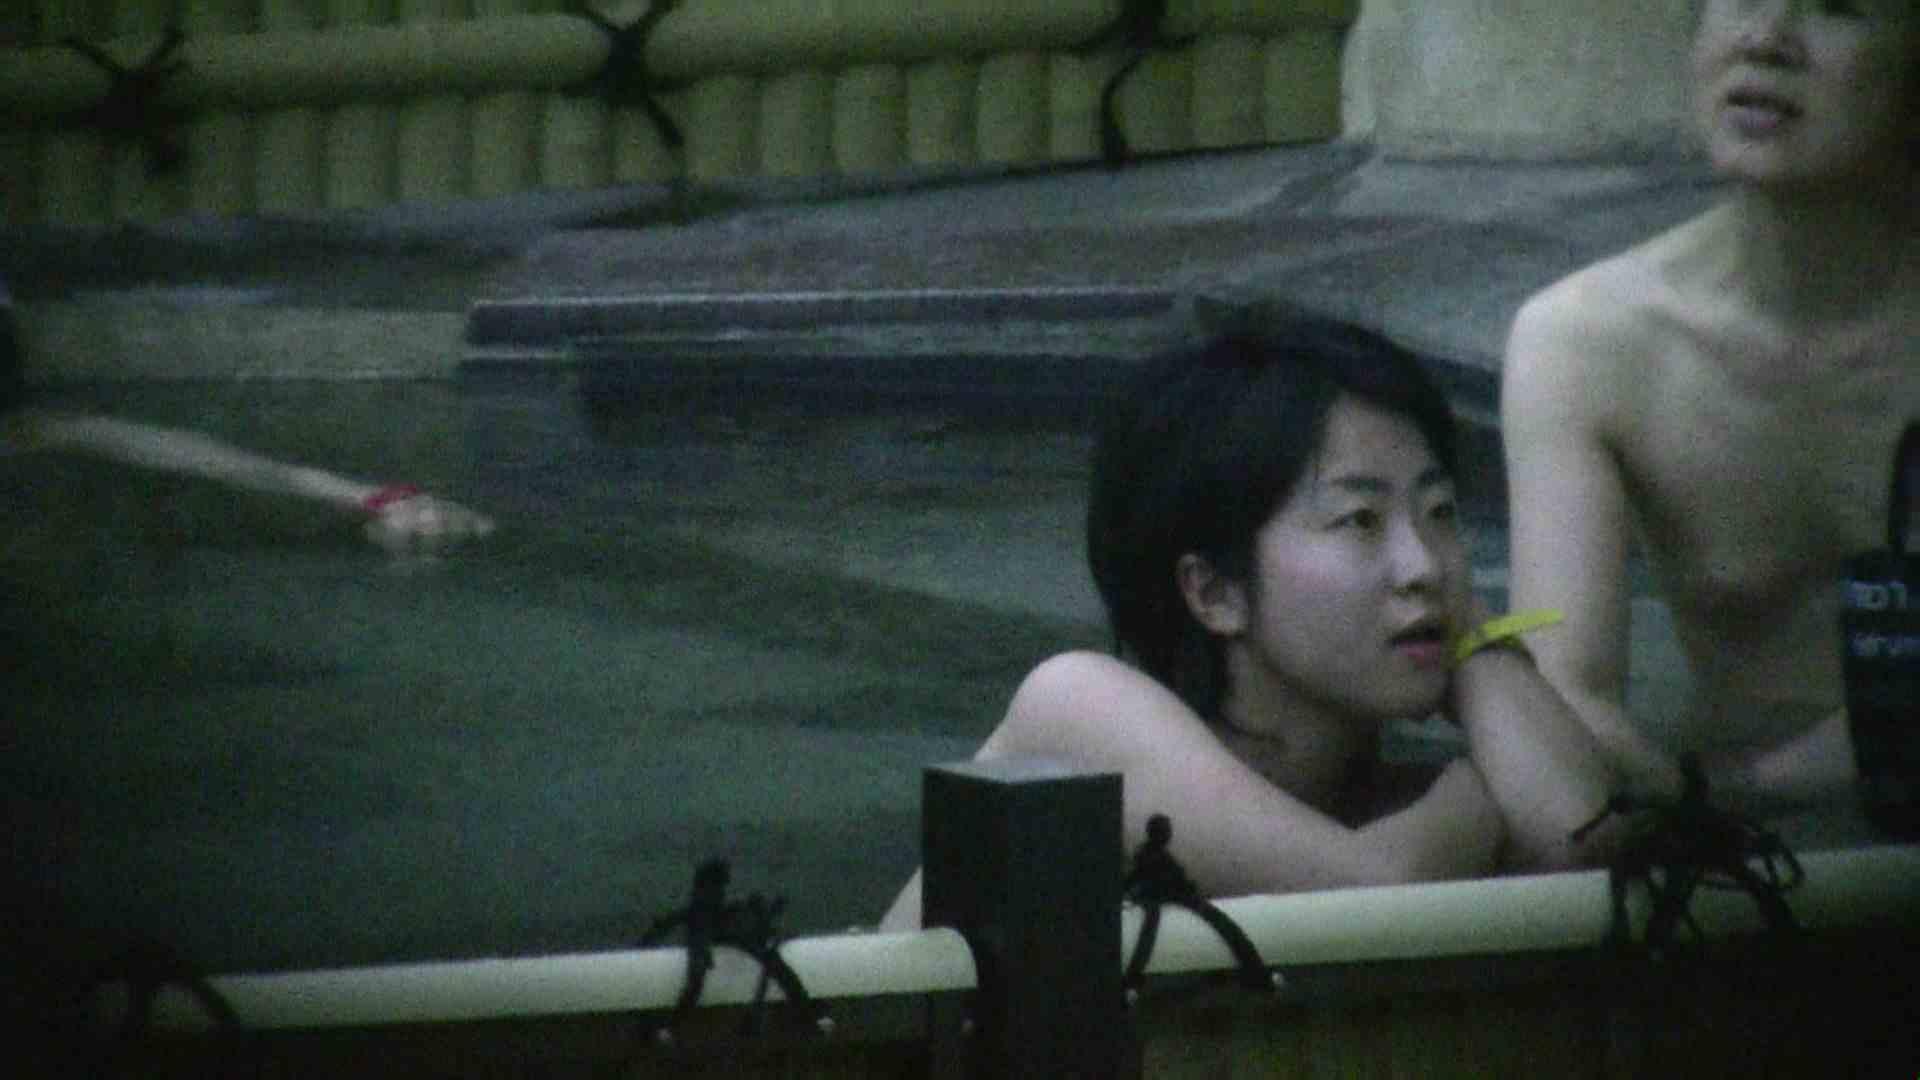 Aquaな露天風呂Vol.112 0  68連発 42